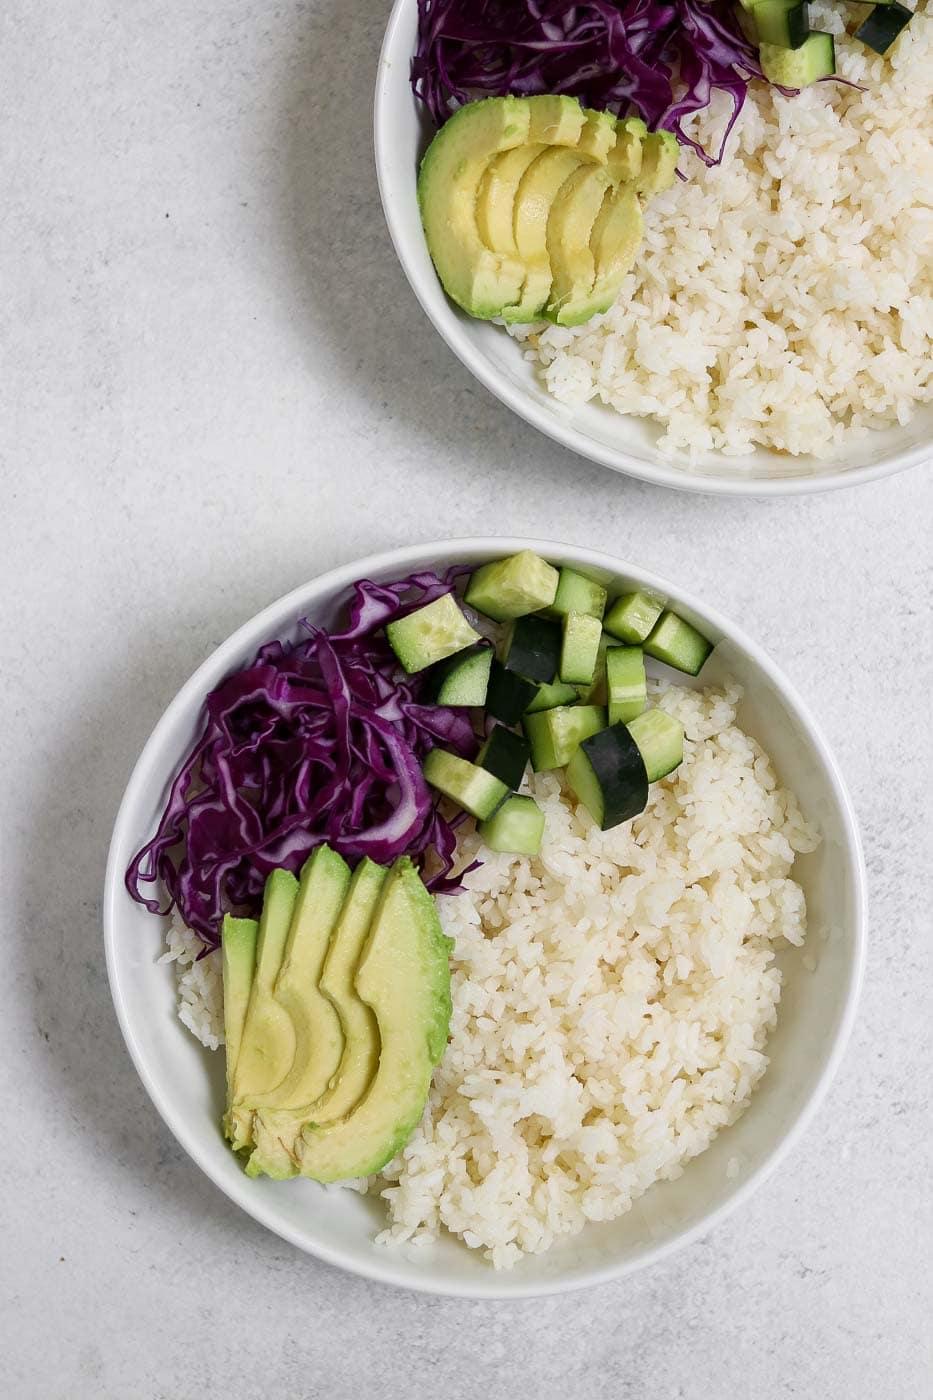 White rice with avocado and veggies.